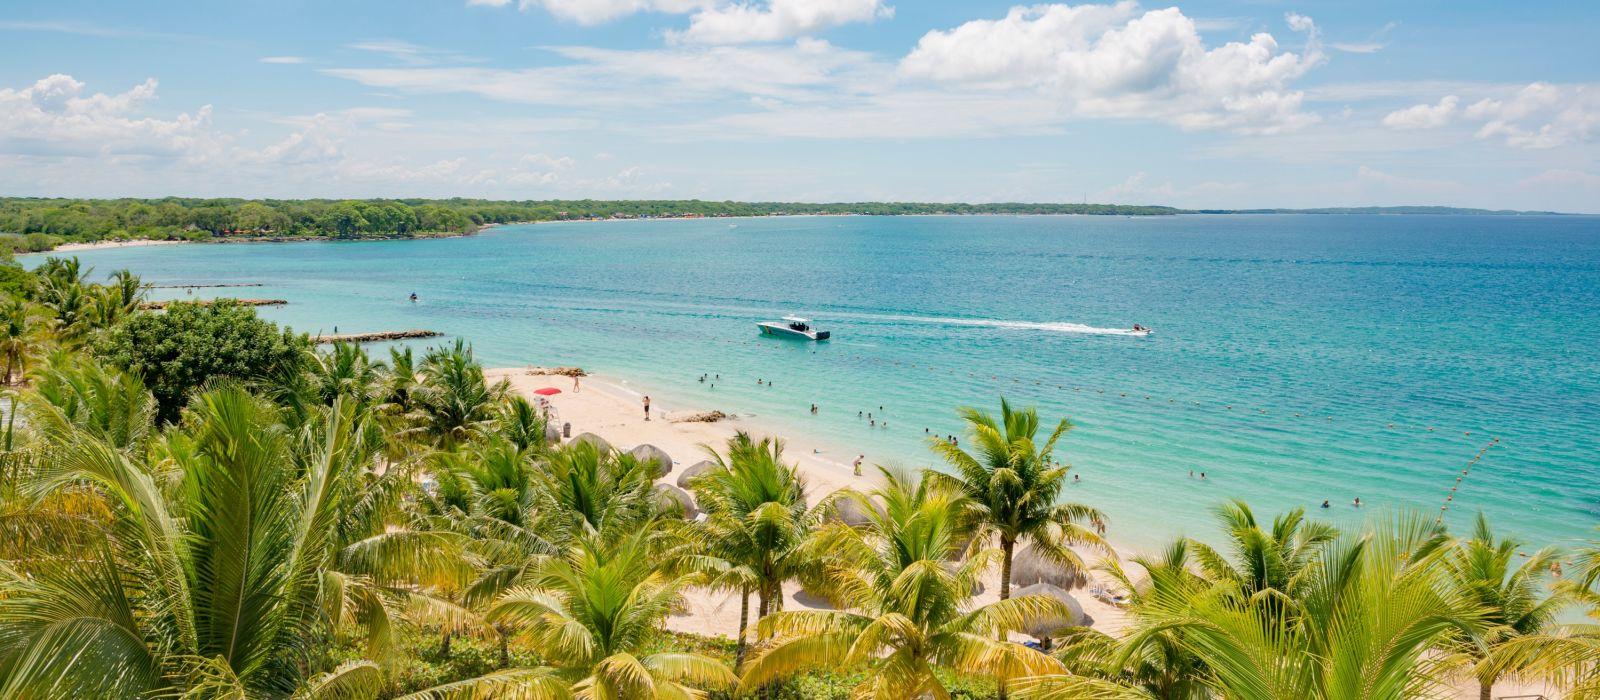 Kolumbien: Cartagena, Kaffeeregion & Isla Baru Urlaub 1